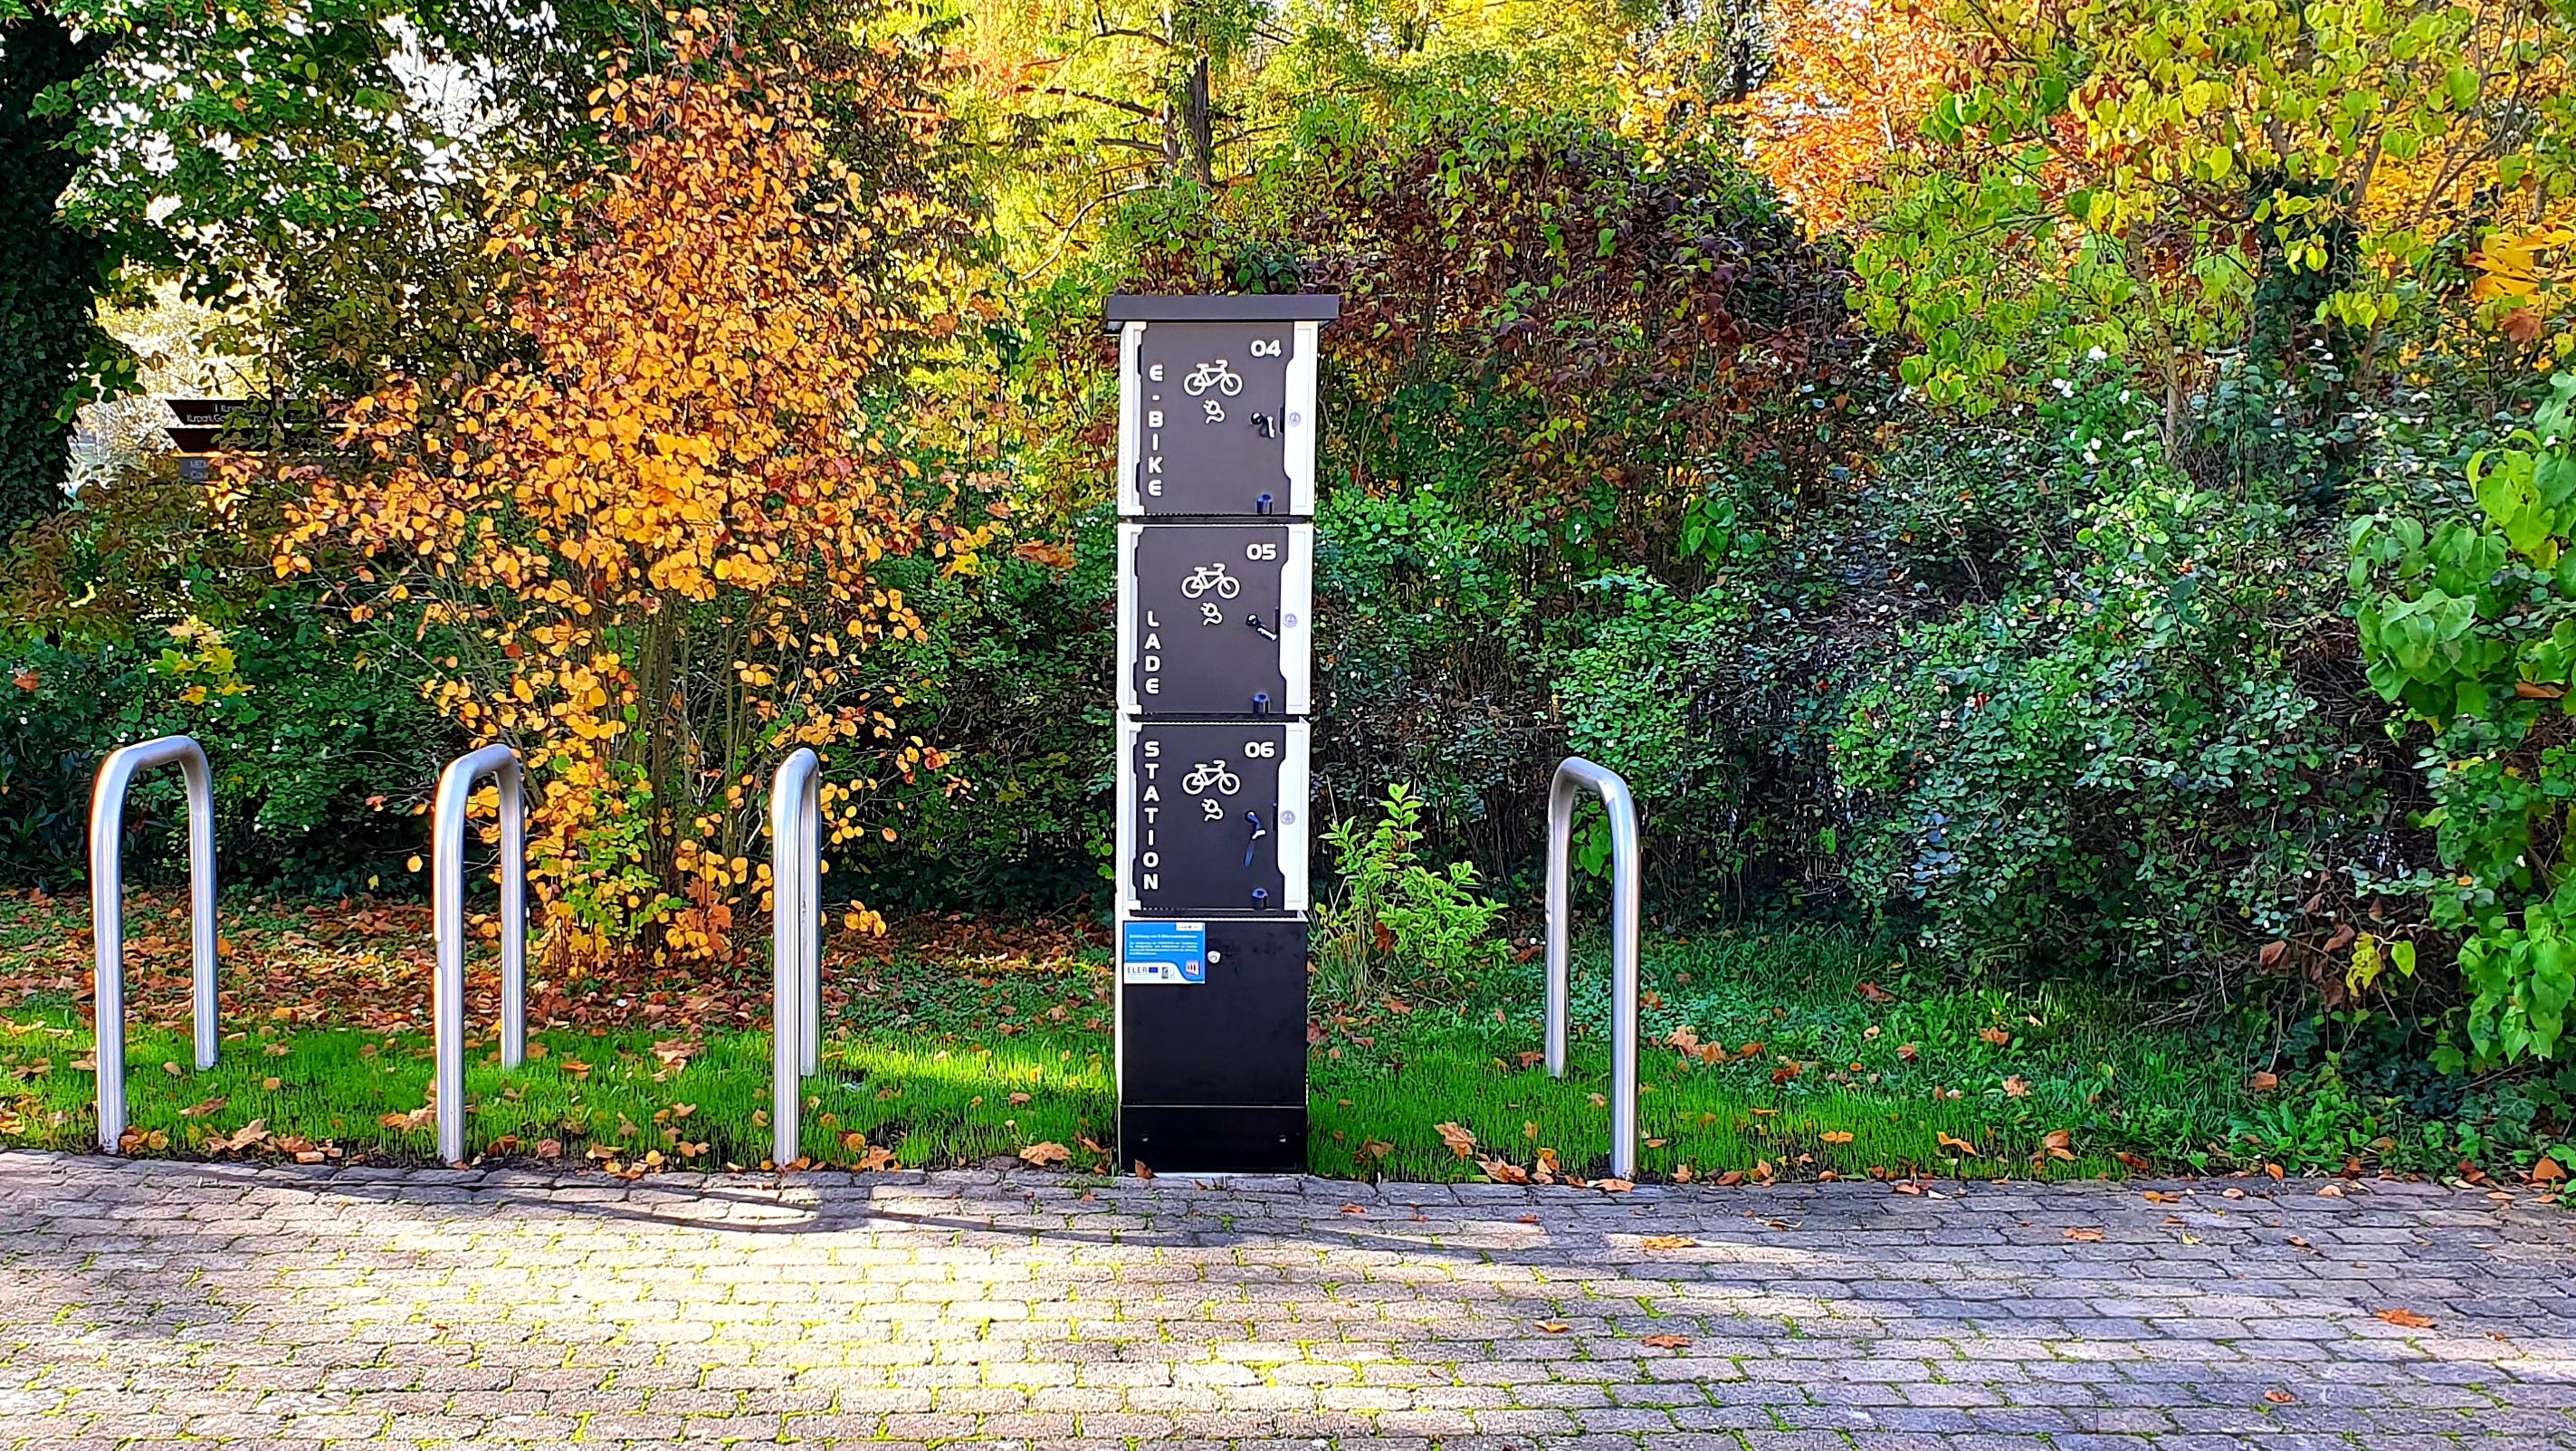 E-Bike-Ladestation an der Tourist-Information Bad Berka, Quelle: Stadt Bad Berka